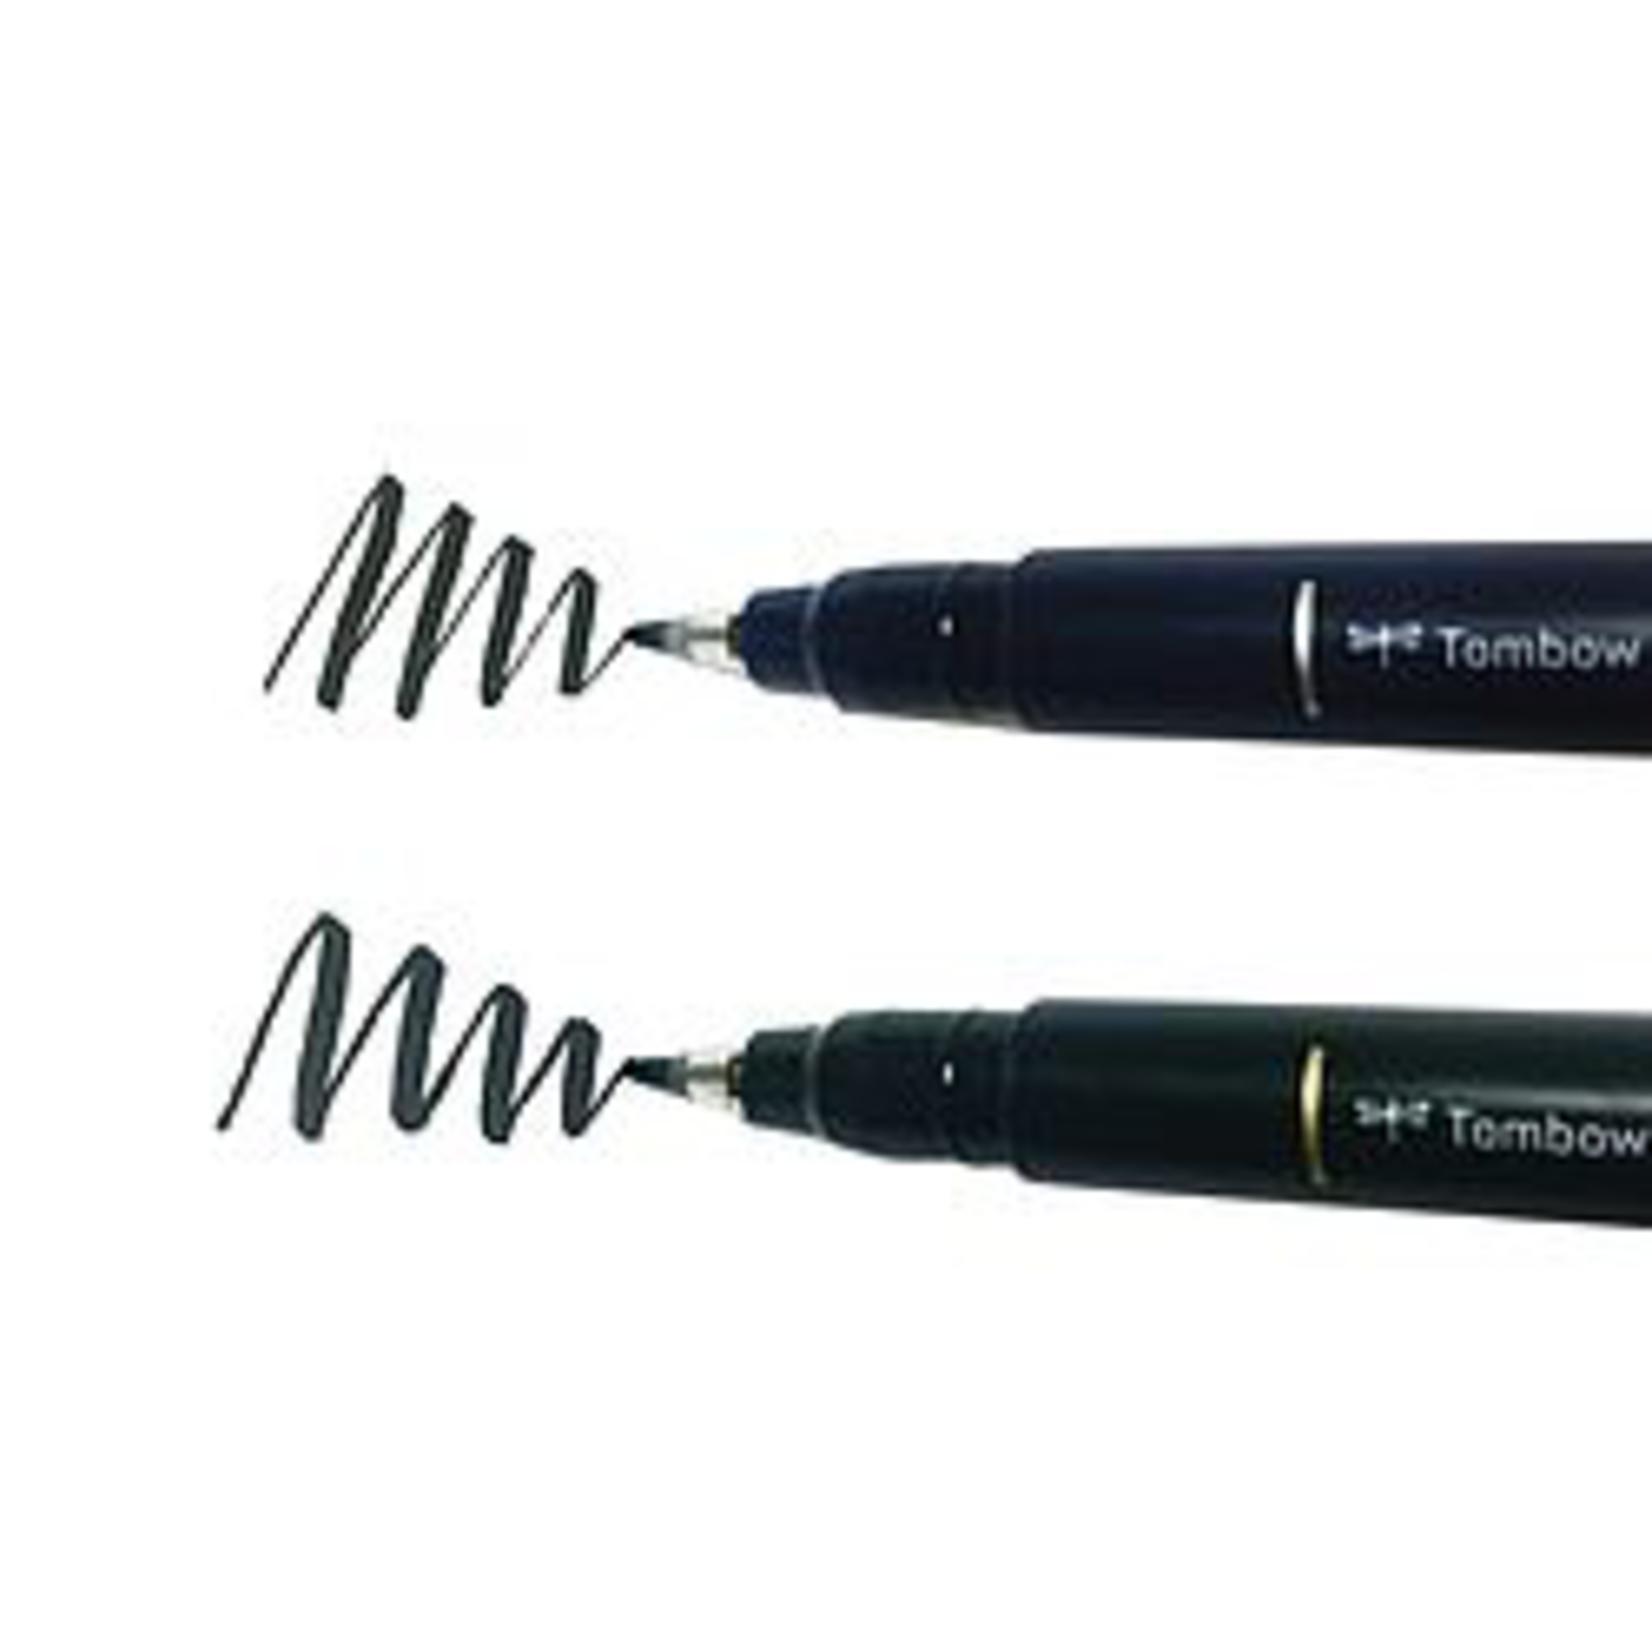 Tombow Fudenosuke Pen weiche Spitze schwarz